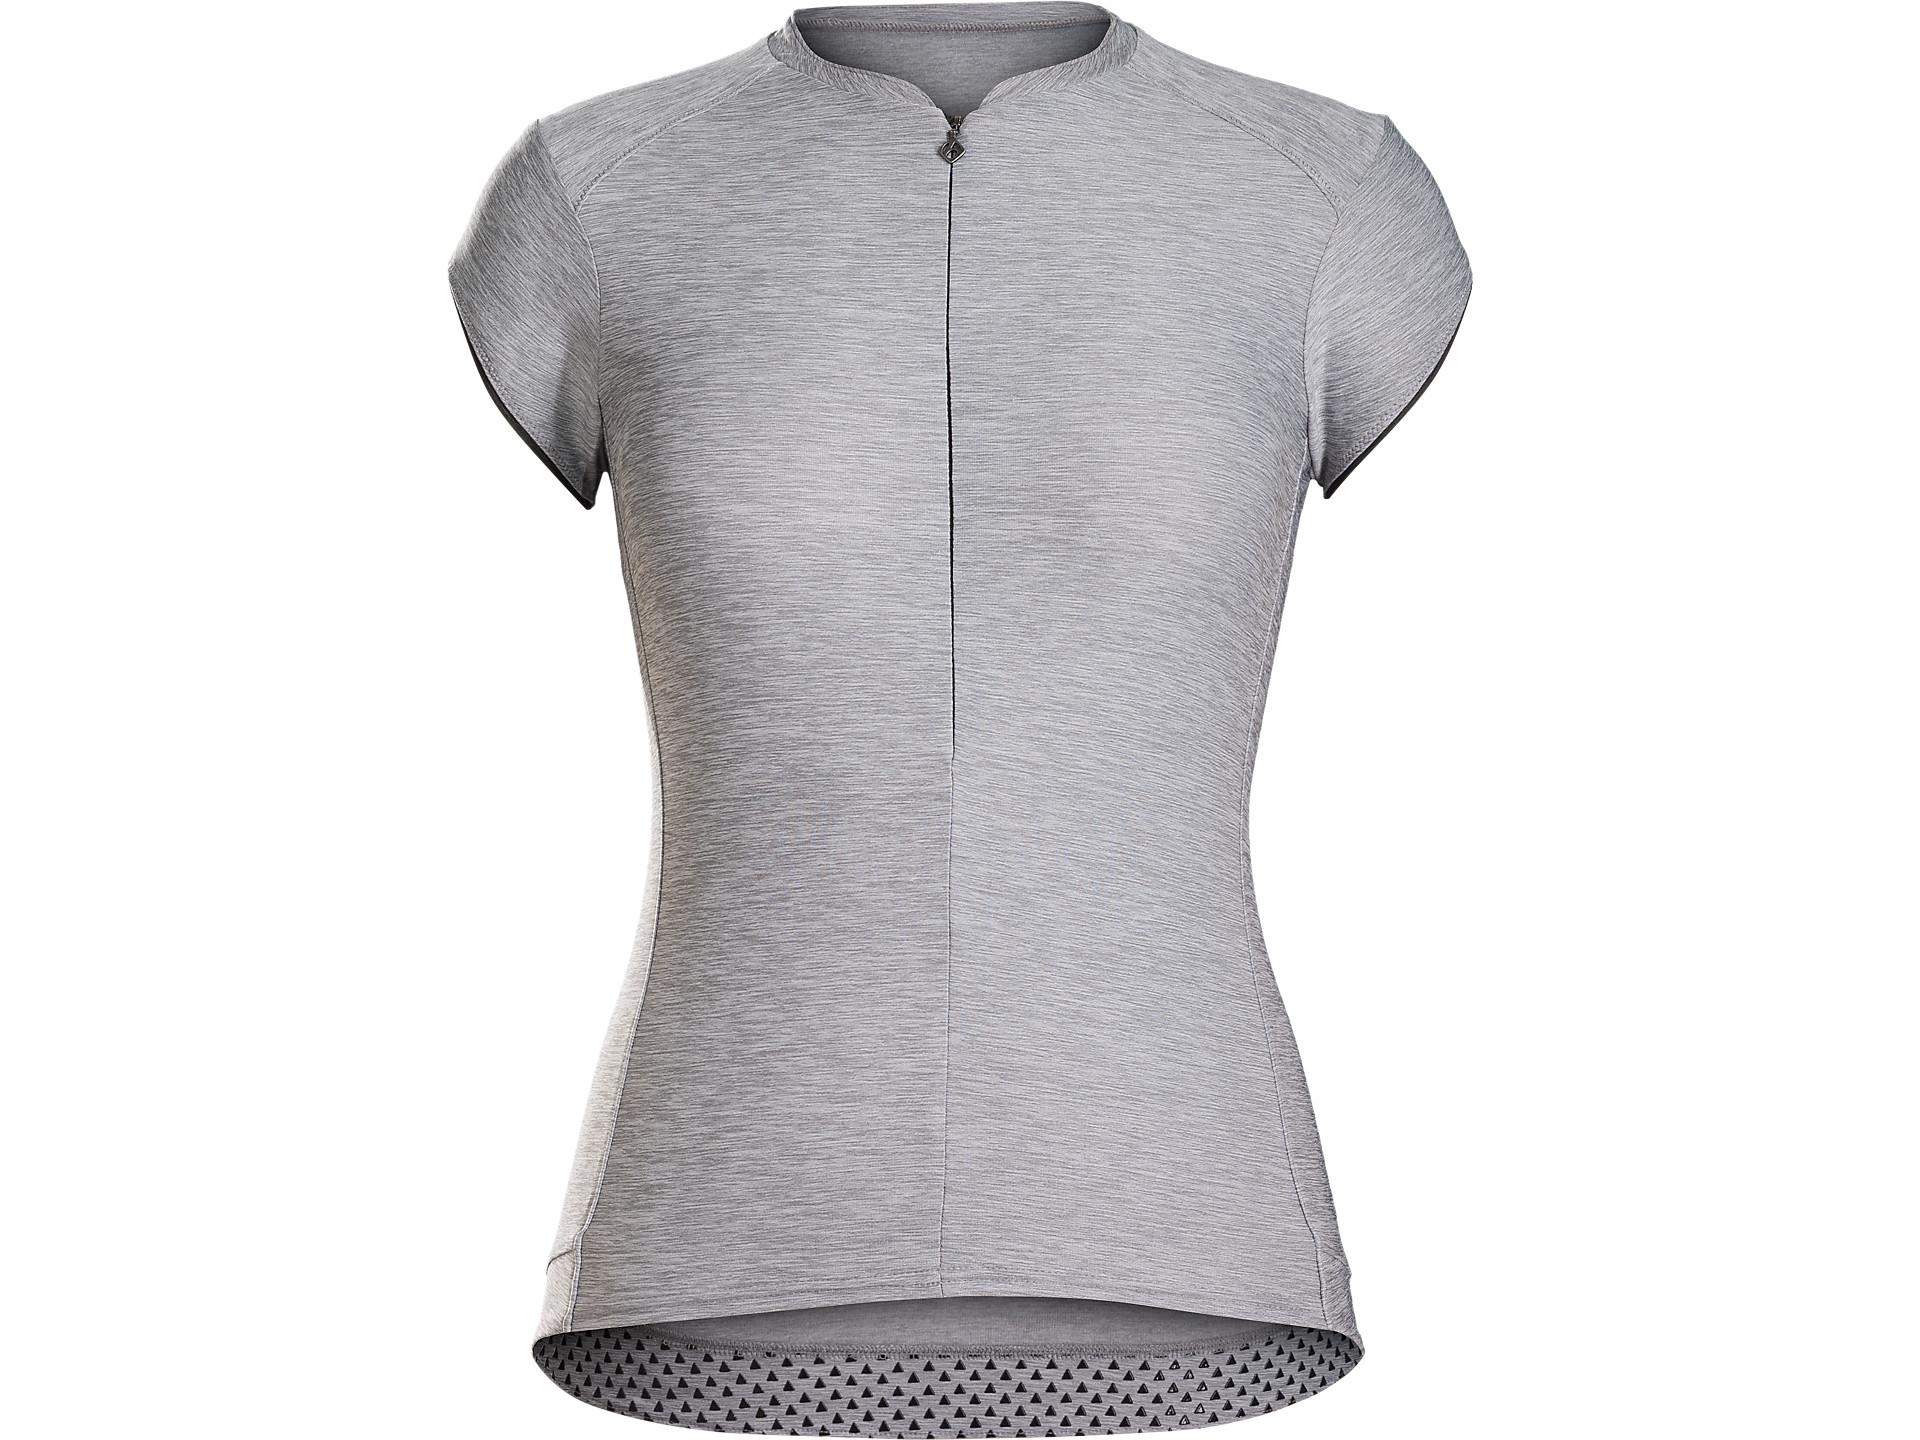 9e331828a Bontrager Vella Women s Cycling Jersey